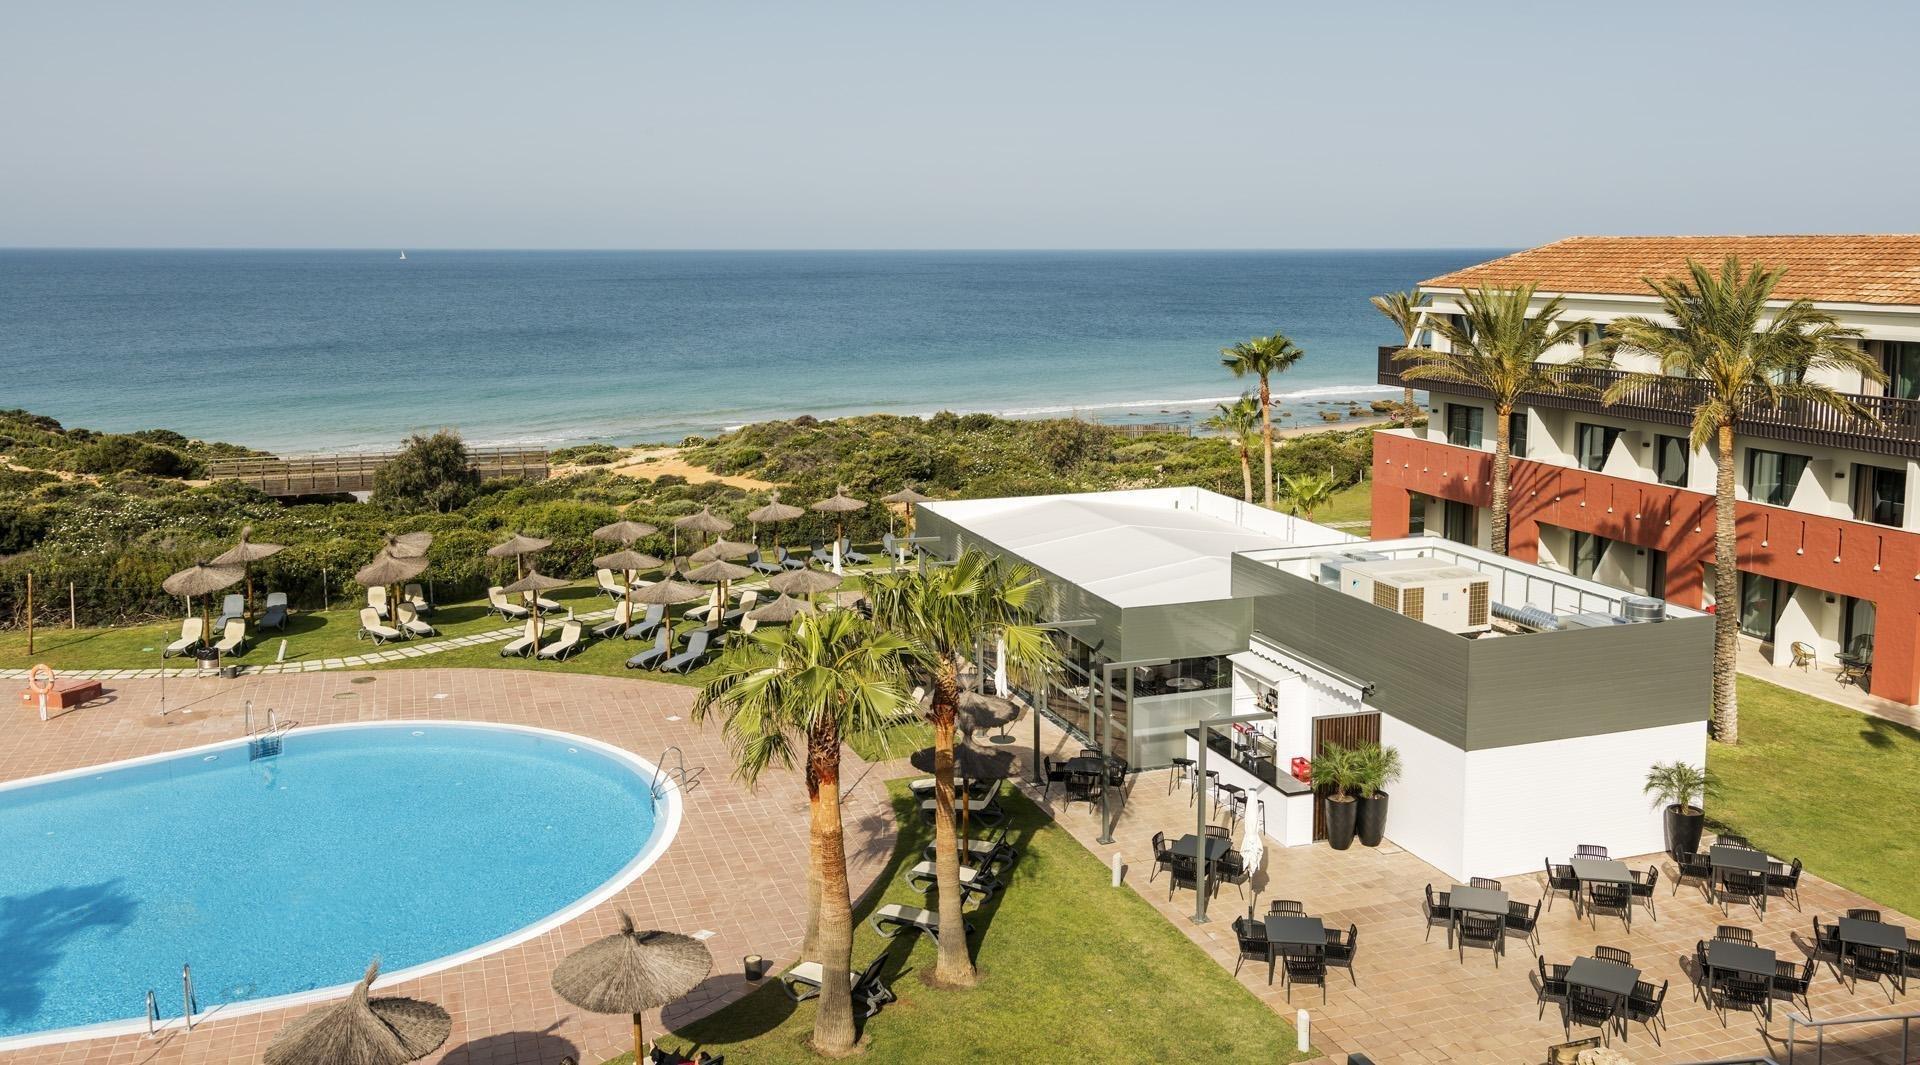 Ilunion Hotels Calas De Conil Offizielle Website Hotel In Cadiz